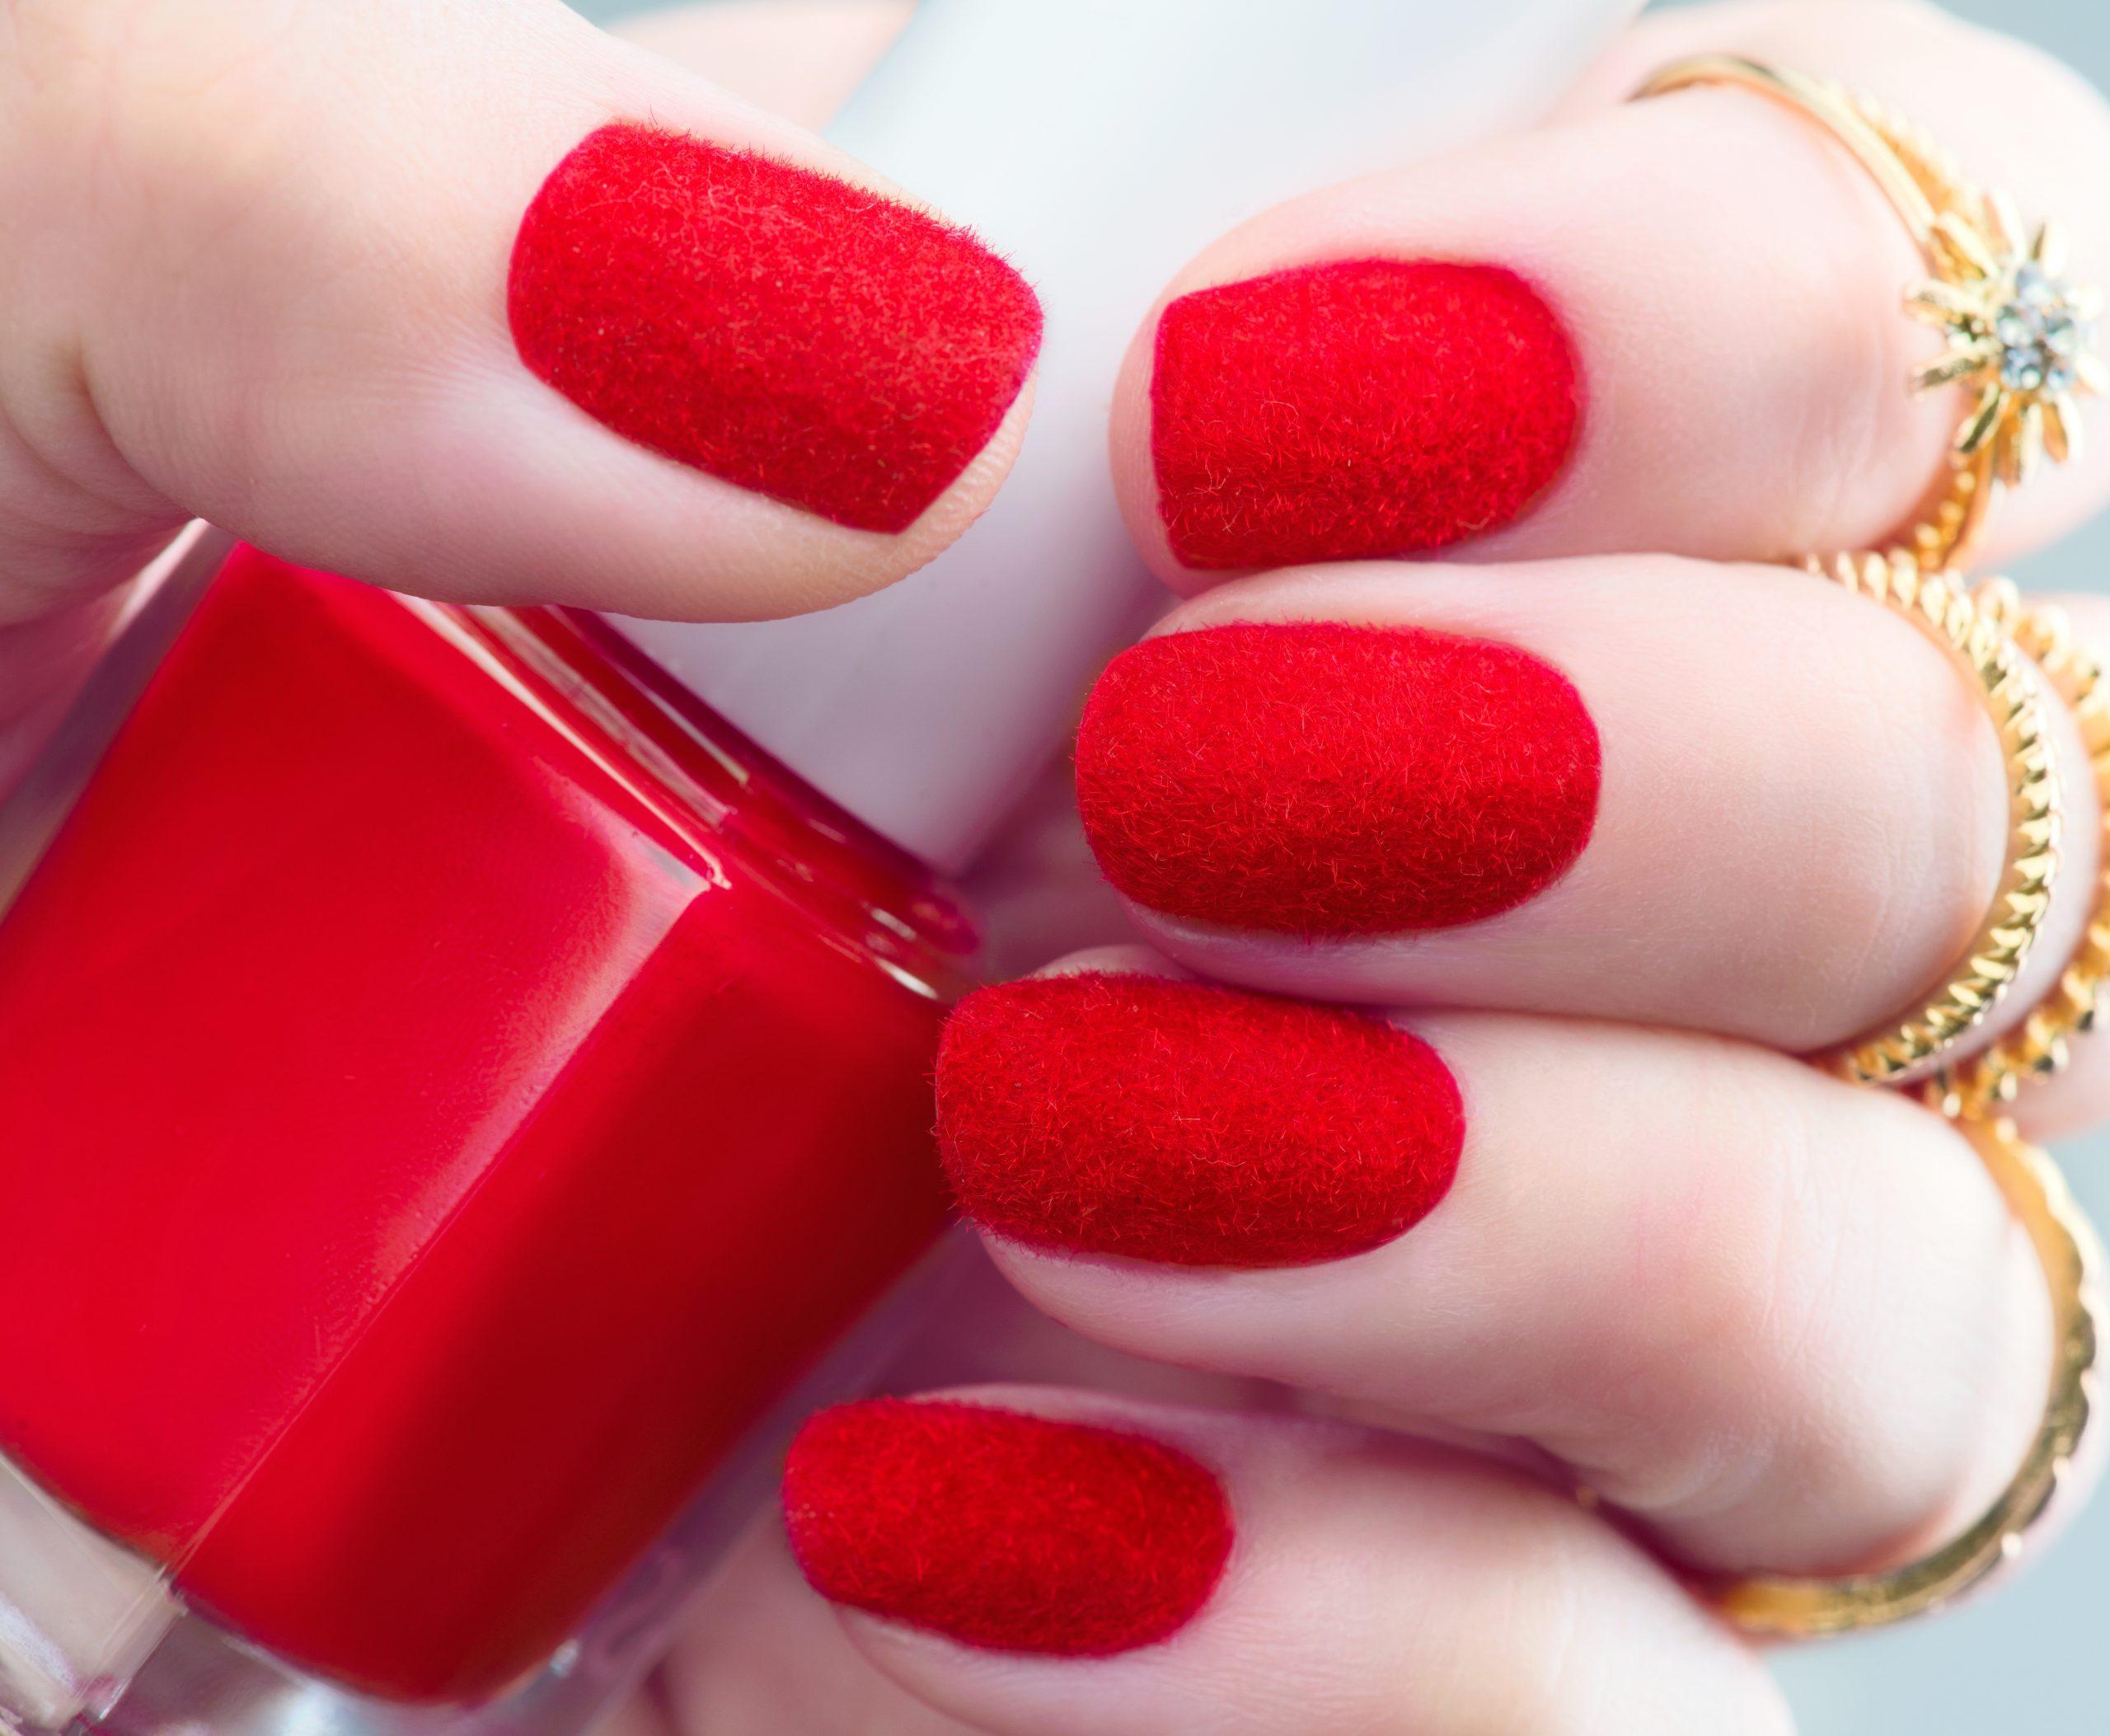 Ongles de velours. Mode création d'ongles rouges fluffy tendance en gros plan